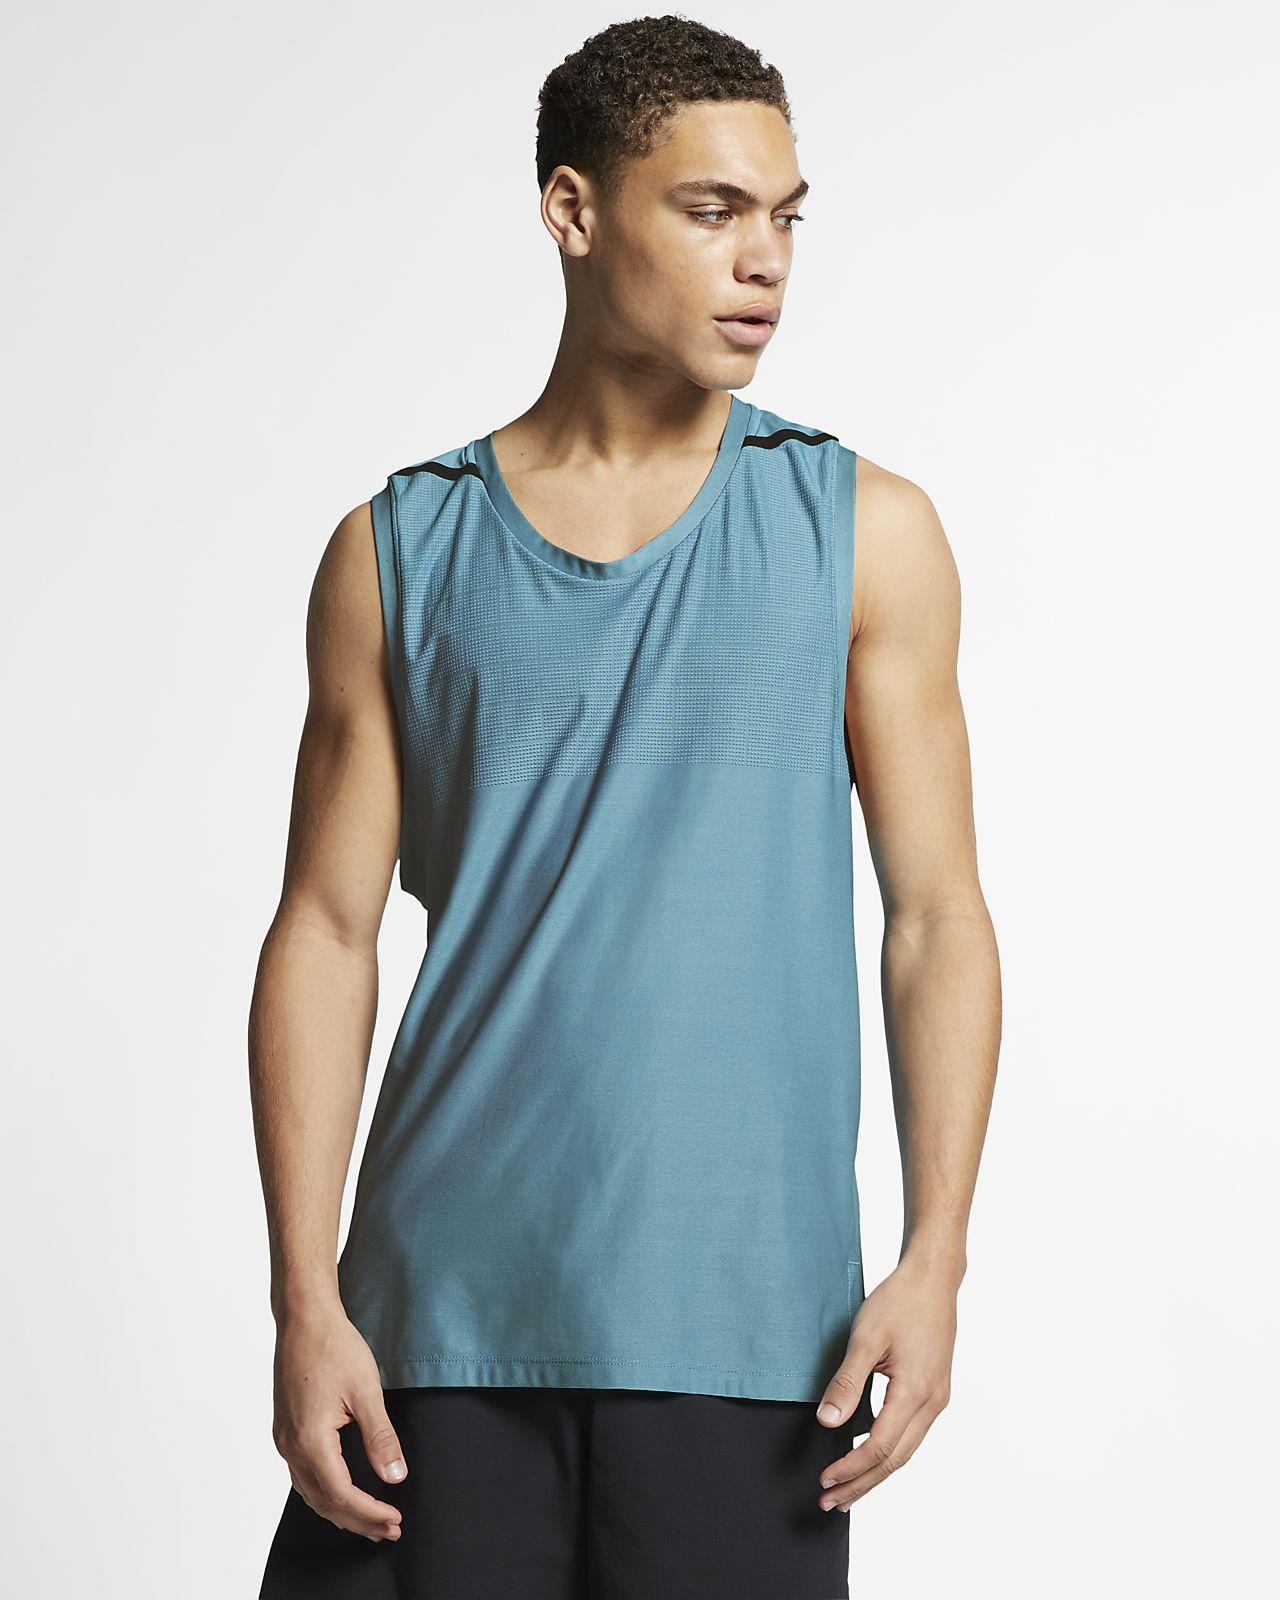 Nike Dri-FIT Tech Pack Camiseta de tirantes de entrenamiento - Hombre